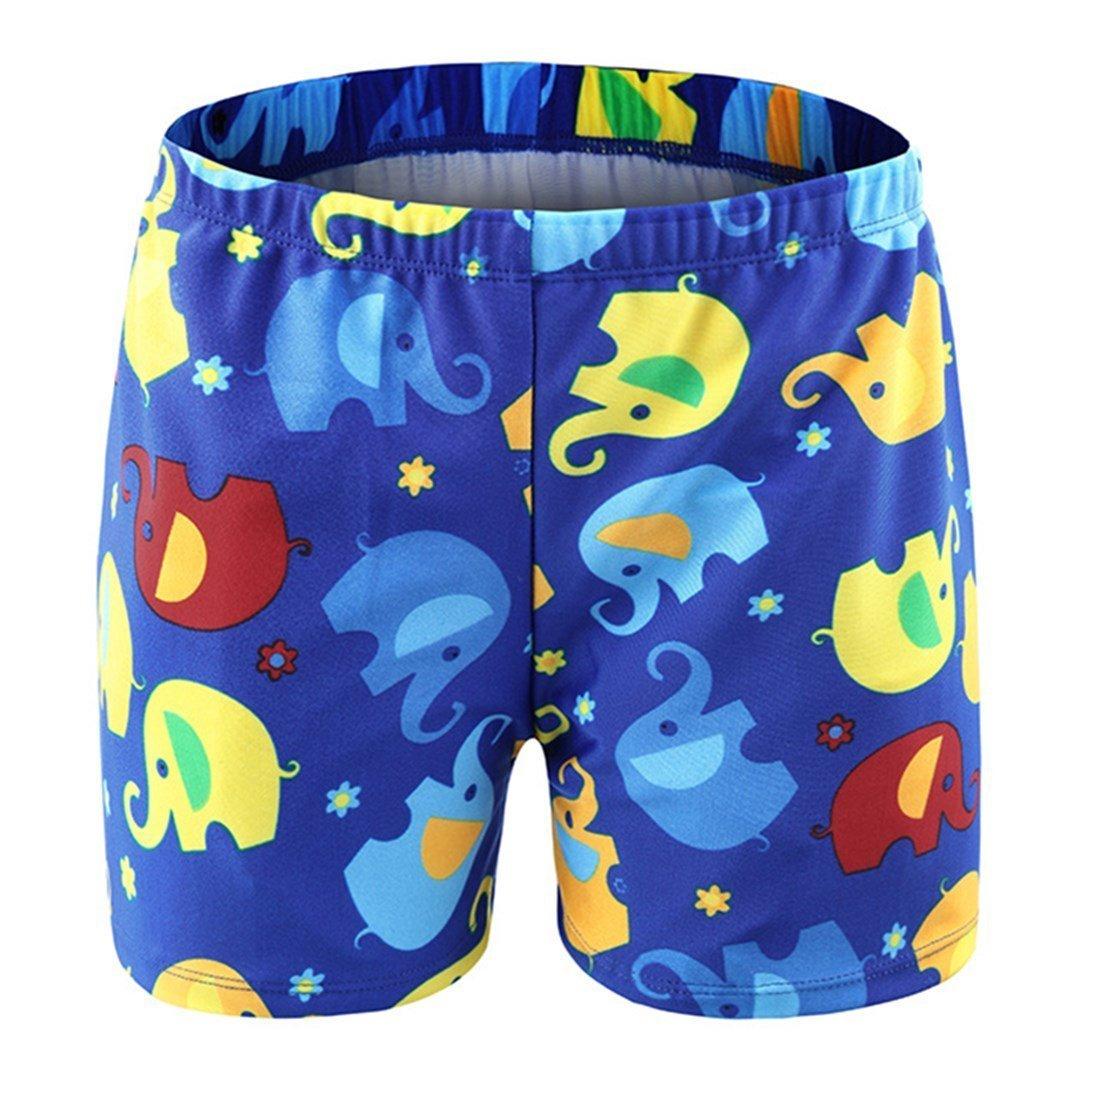 Children's Swimming Trunks Outdoor Travel Beach Hot Spring Swimming Shorts Boys